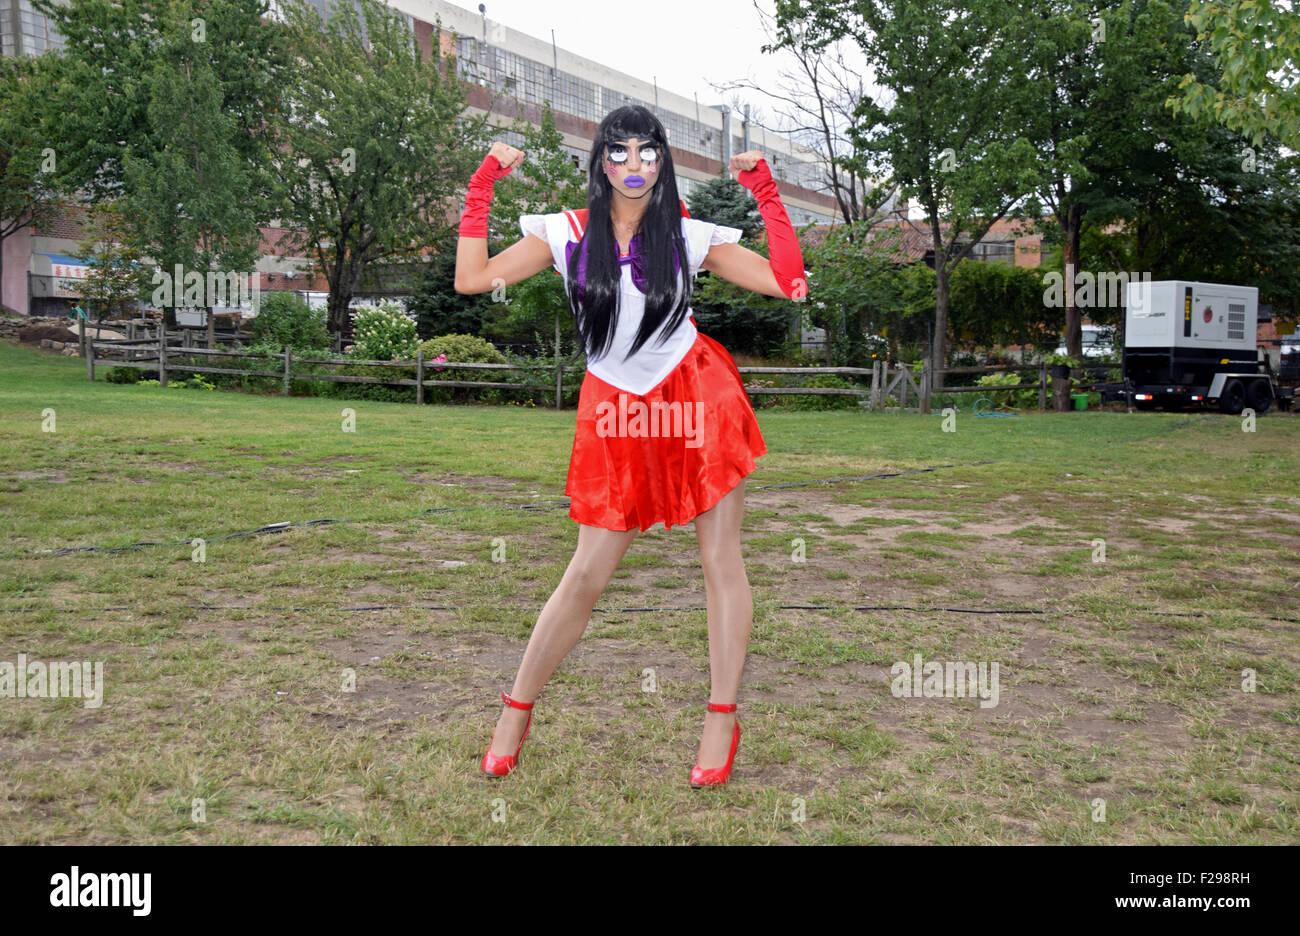 Drag Queen Costume Stockfotos & Drag Queen Costume Bilder - Seite 3 ...